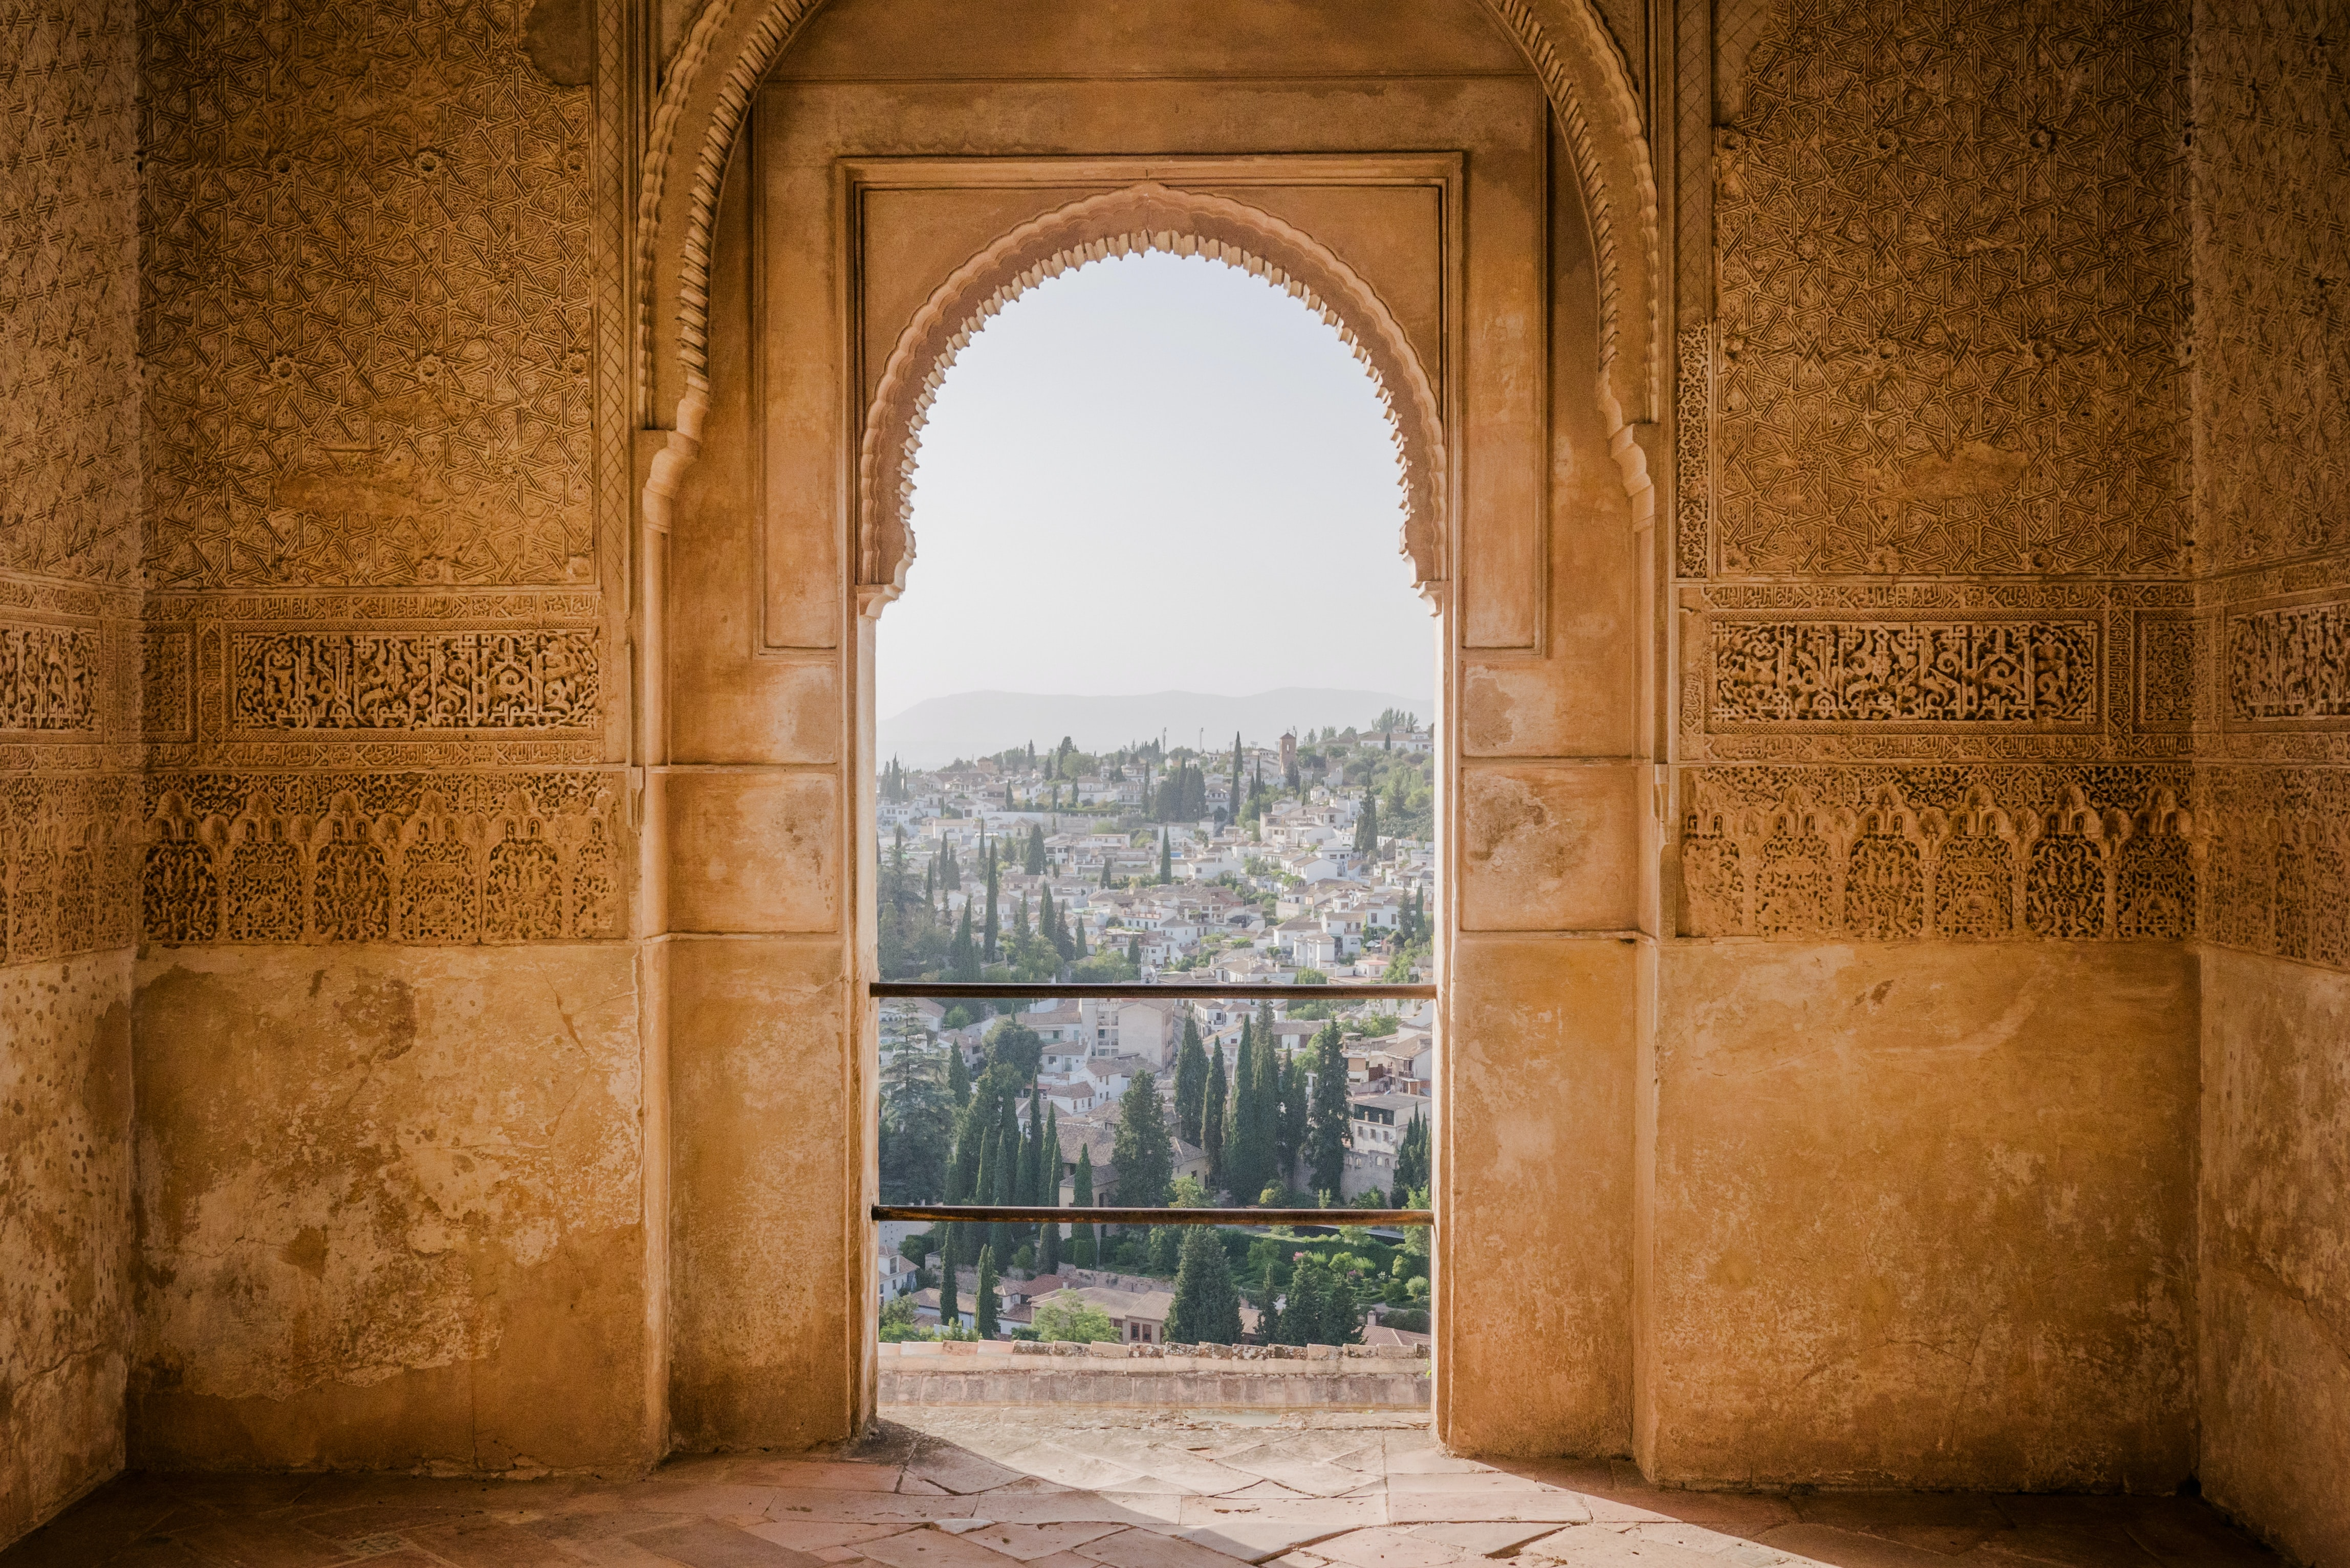 Al-Ándalus (facile)